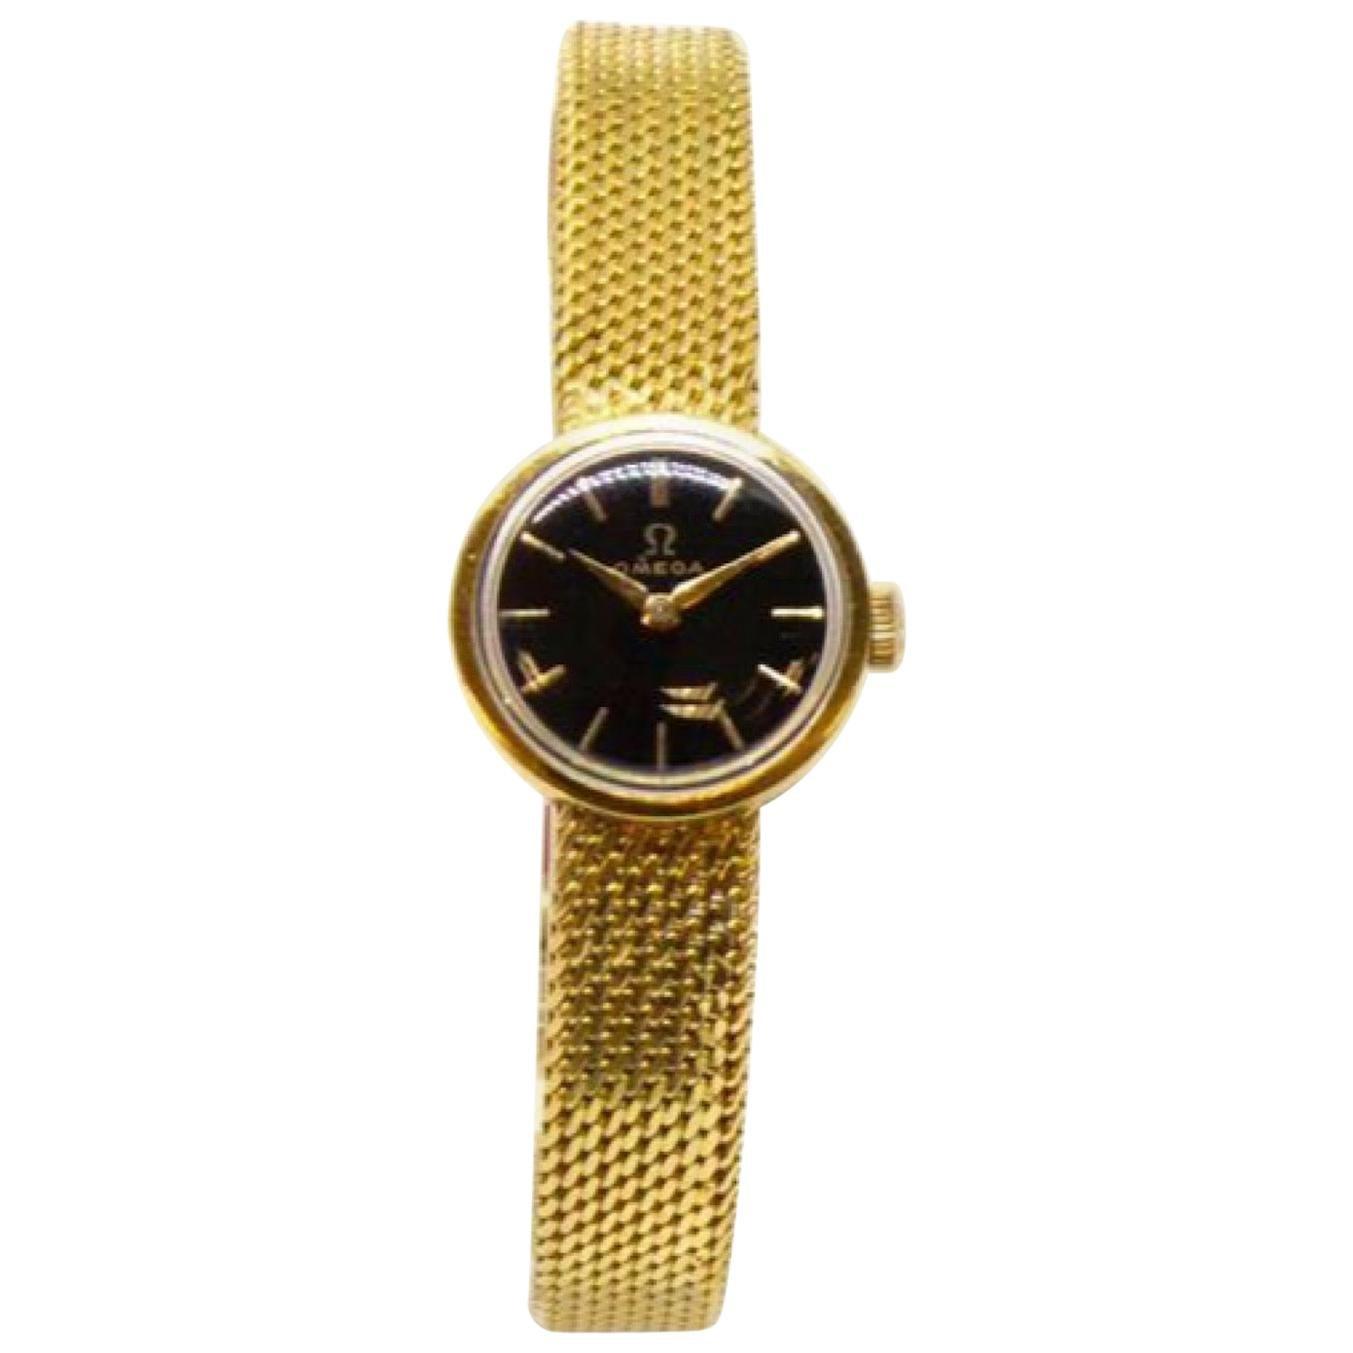 Gold Lady's Omega 1966 Wristwatch